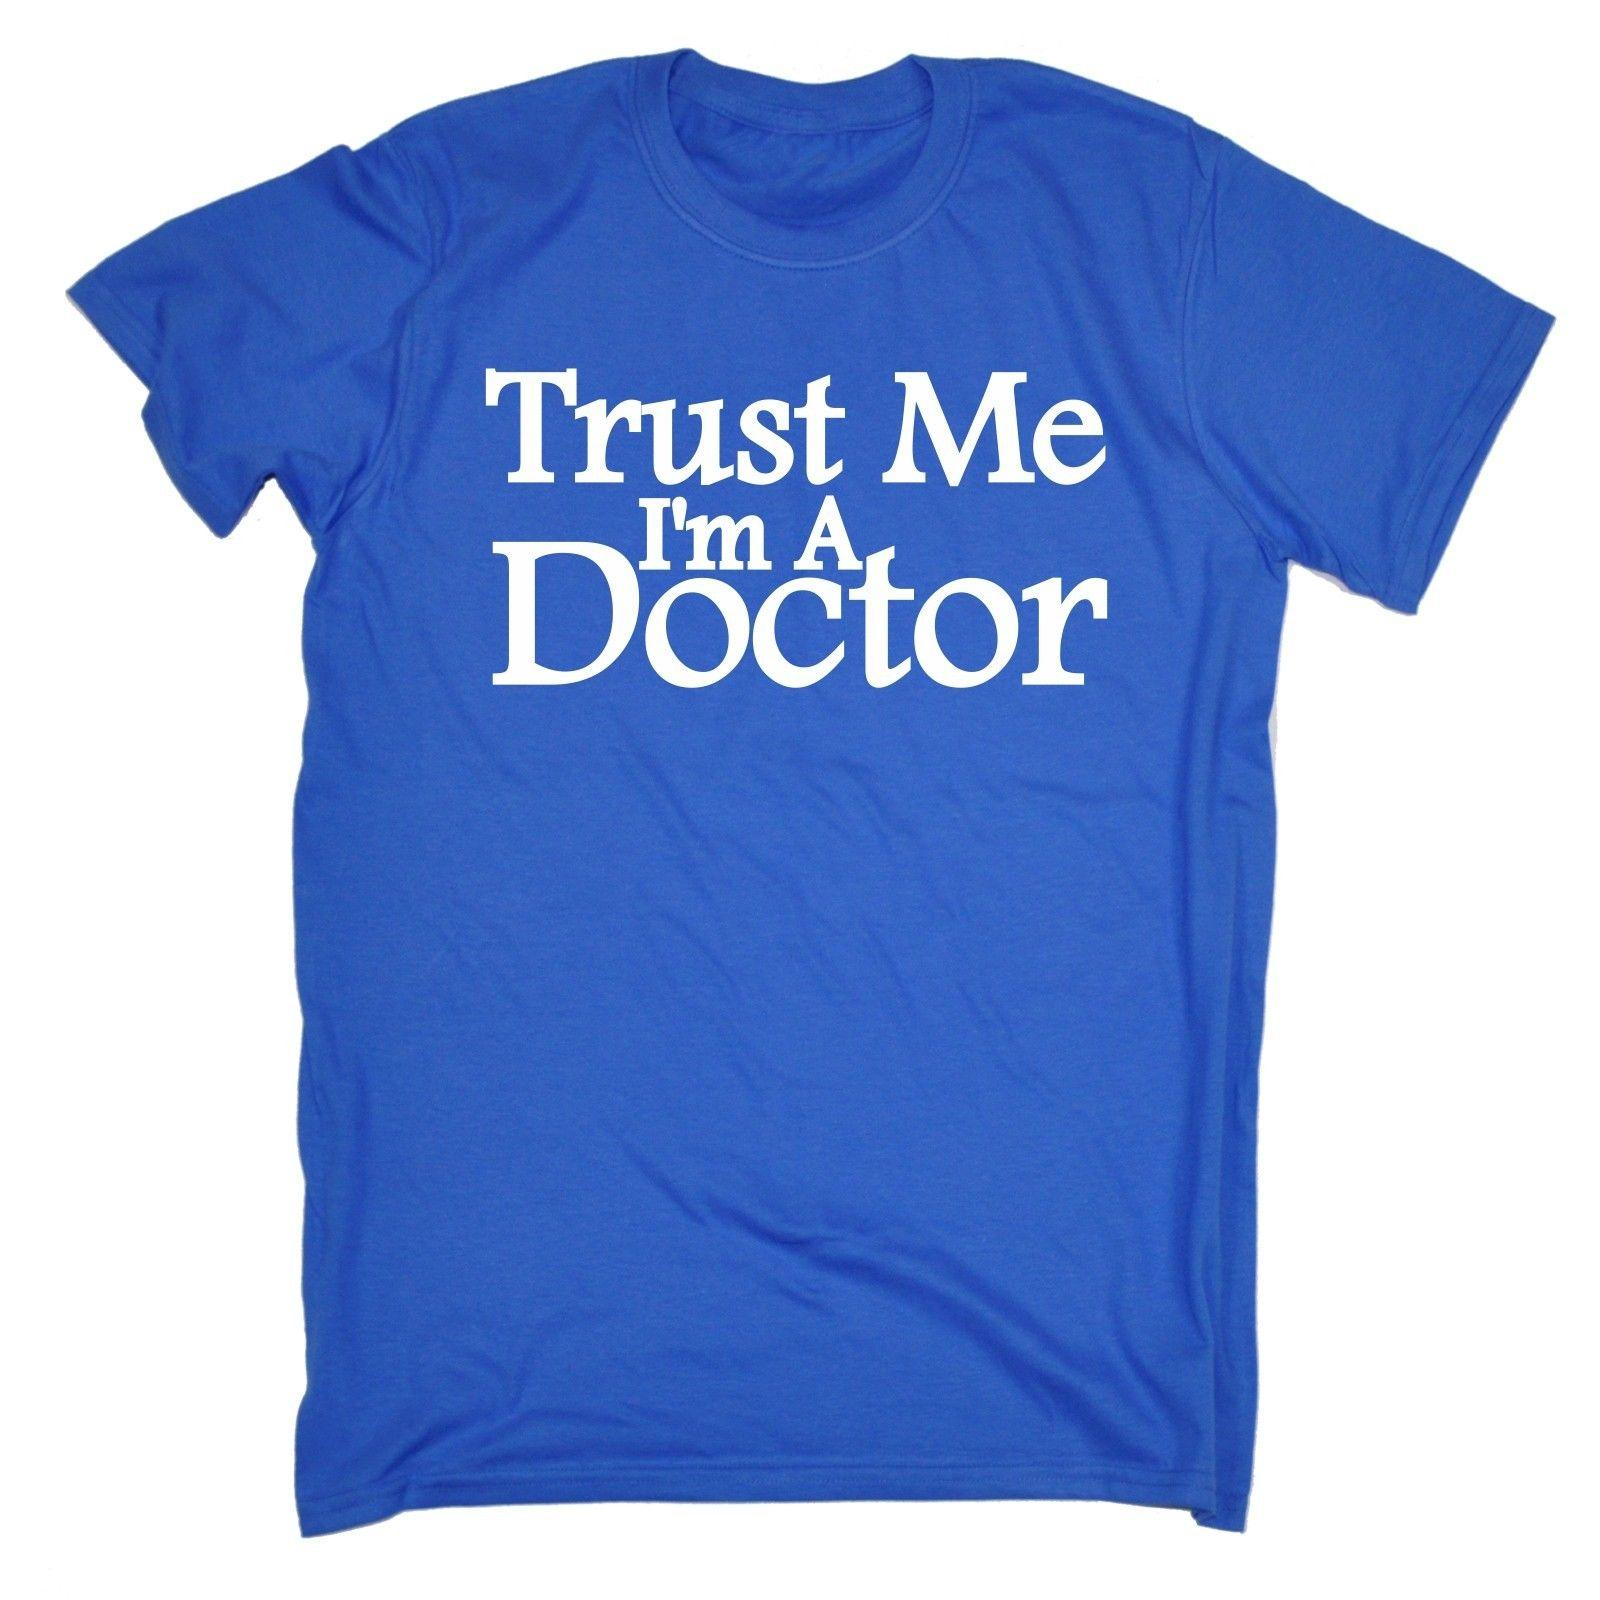 92cff9c9c Trust Me Im A Doctor T SHIRT Medic Dr Gp Surgeon Nurse Tee Birthday Fashion  Gift Funny Unisex Tshirt Top T Shirt Cool Design T Shirts Online From ...